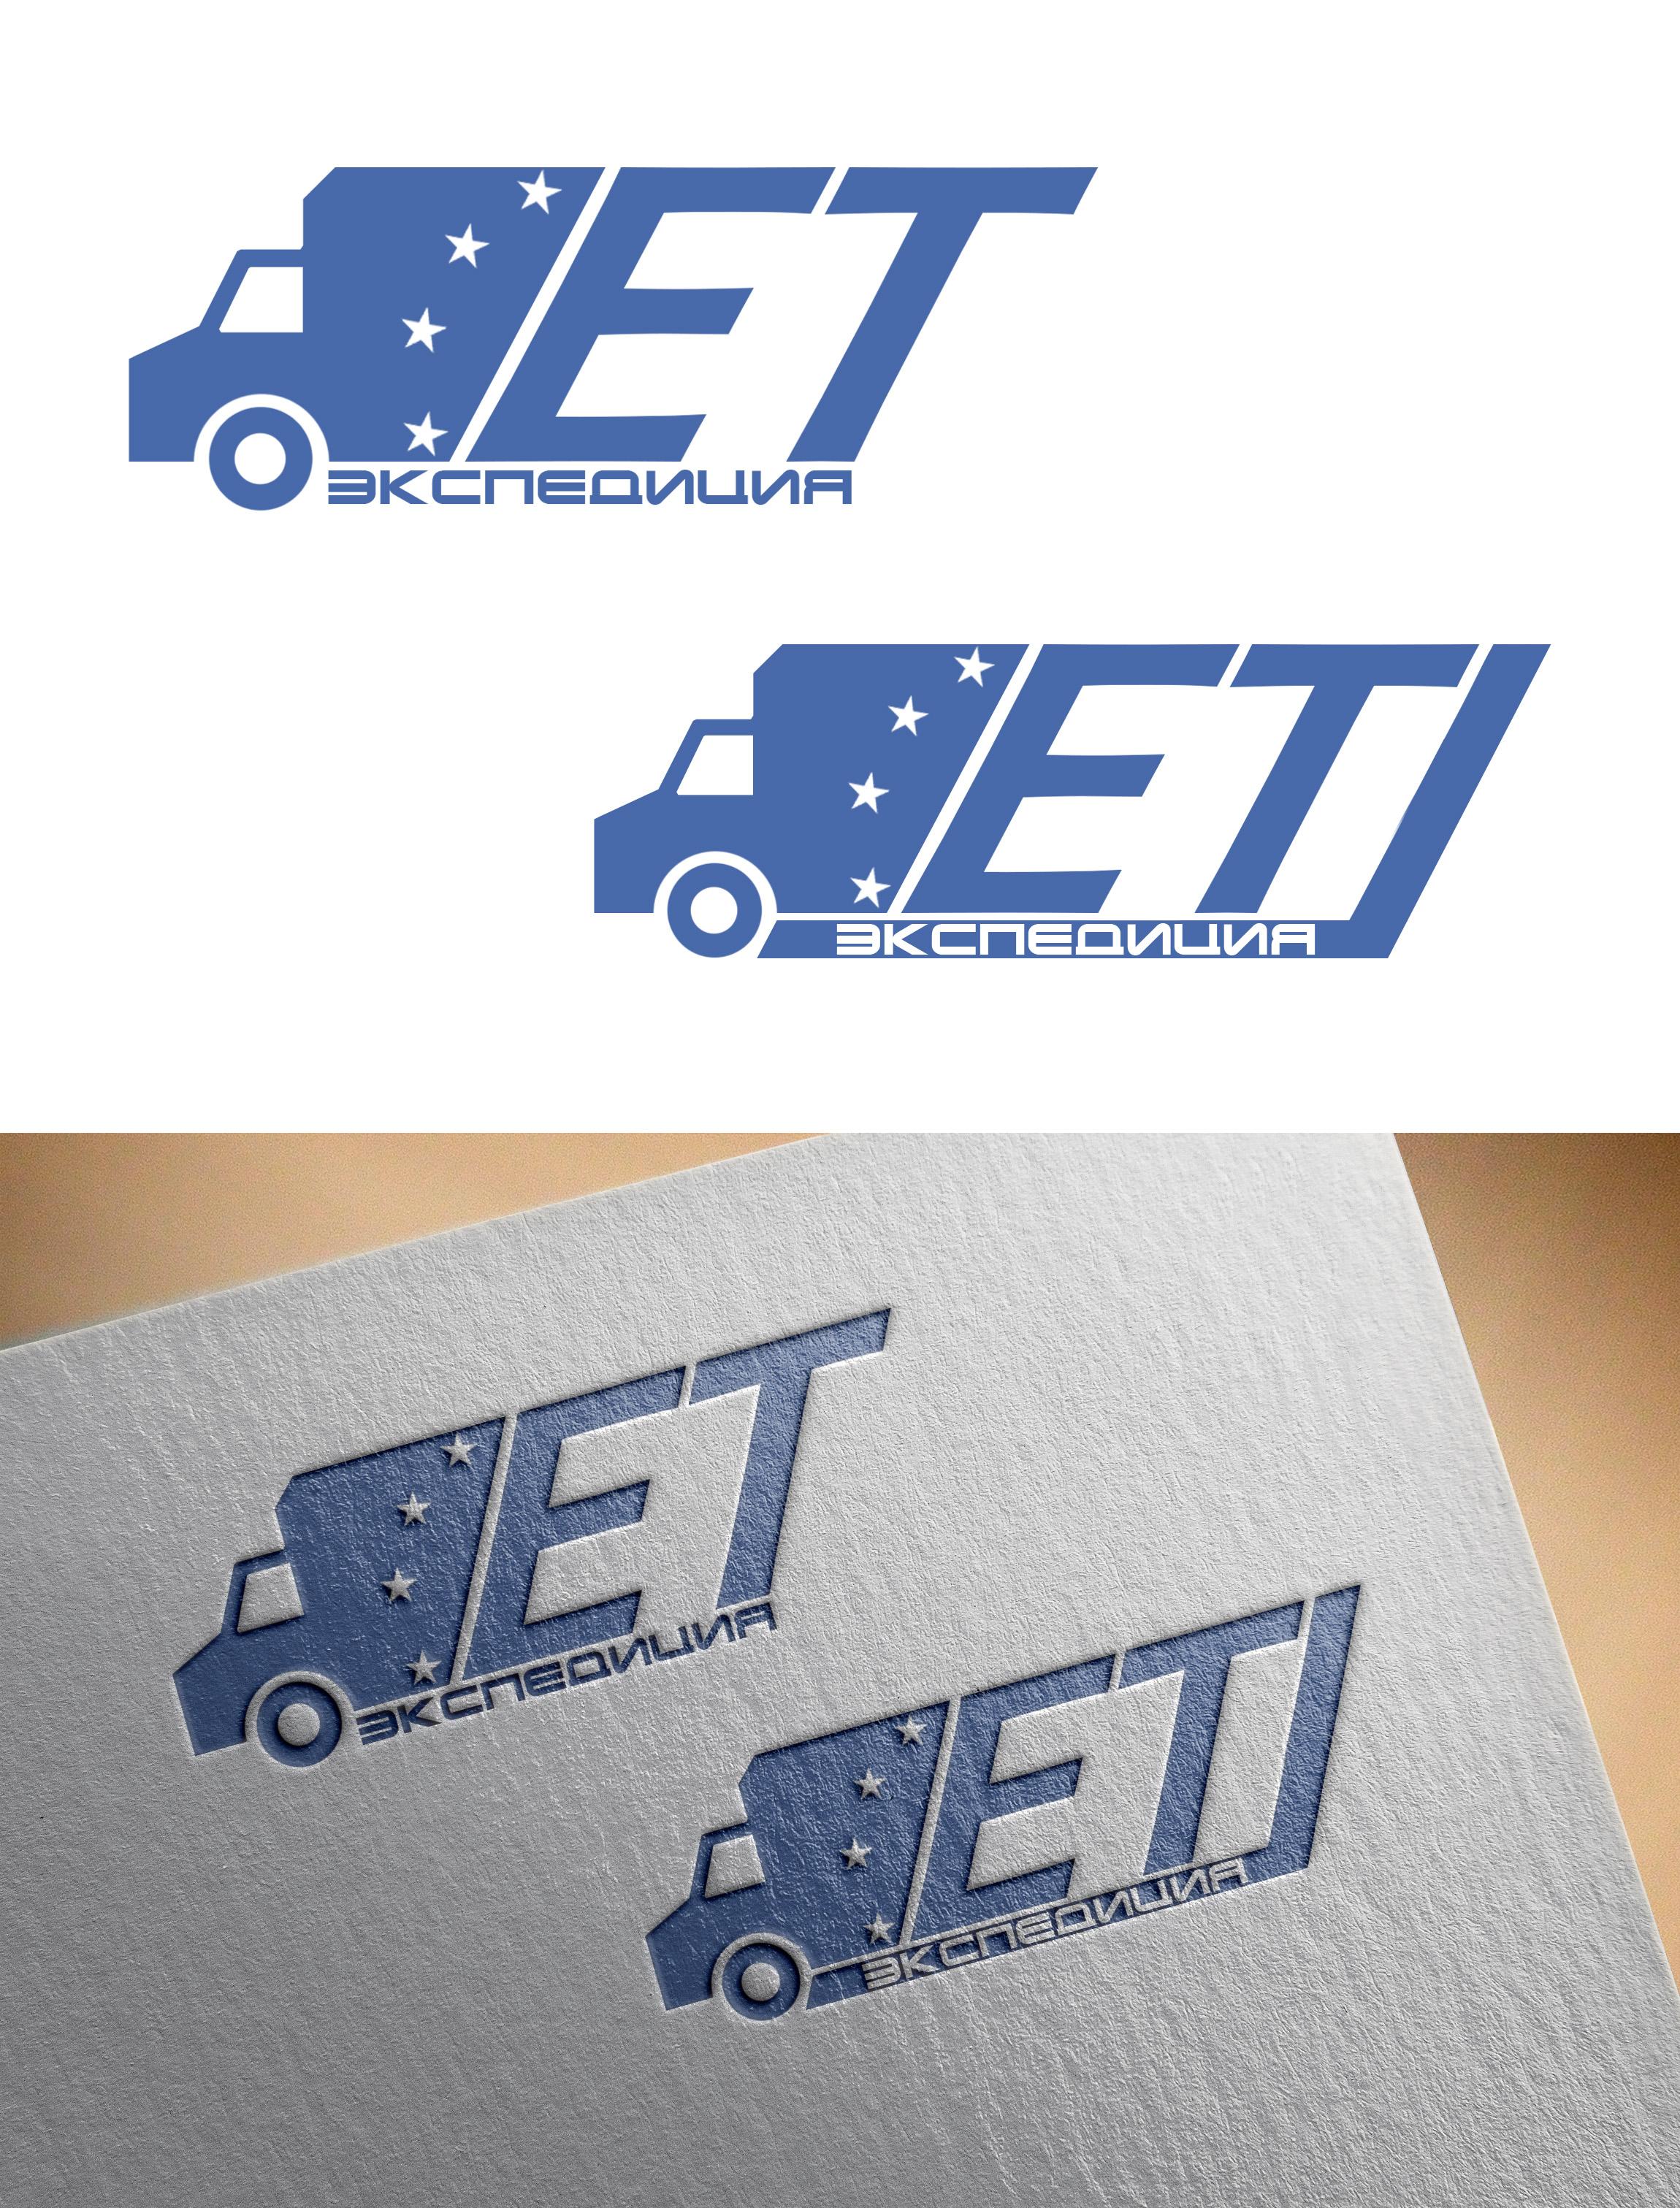 Предложите эволюцию логотипа экспедиторской компании  фото f_91358fb4967880a6.jpg